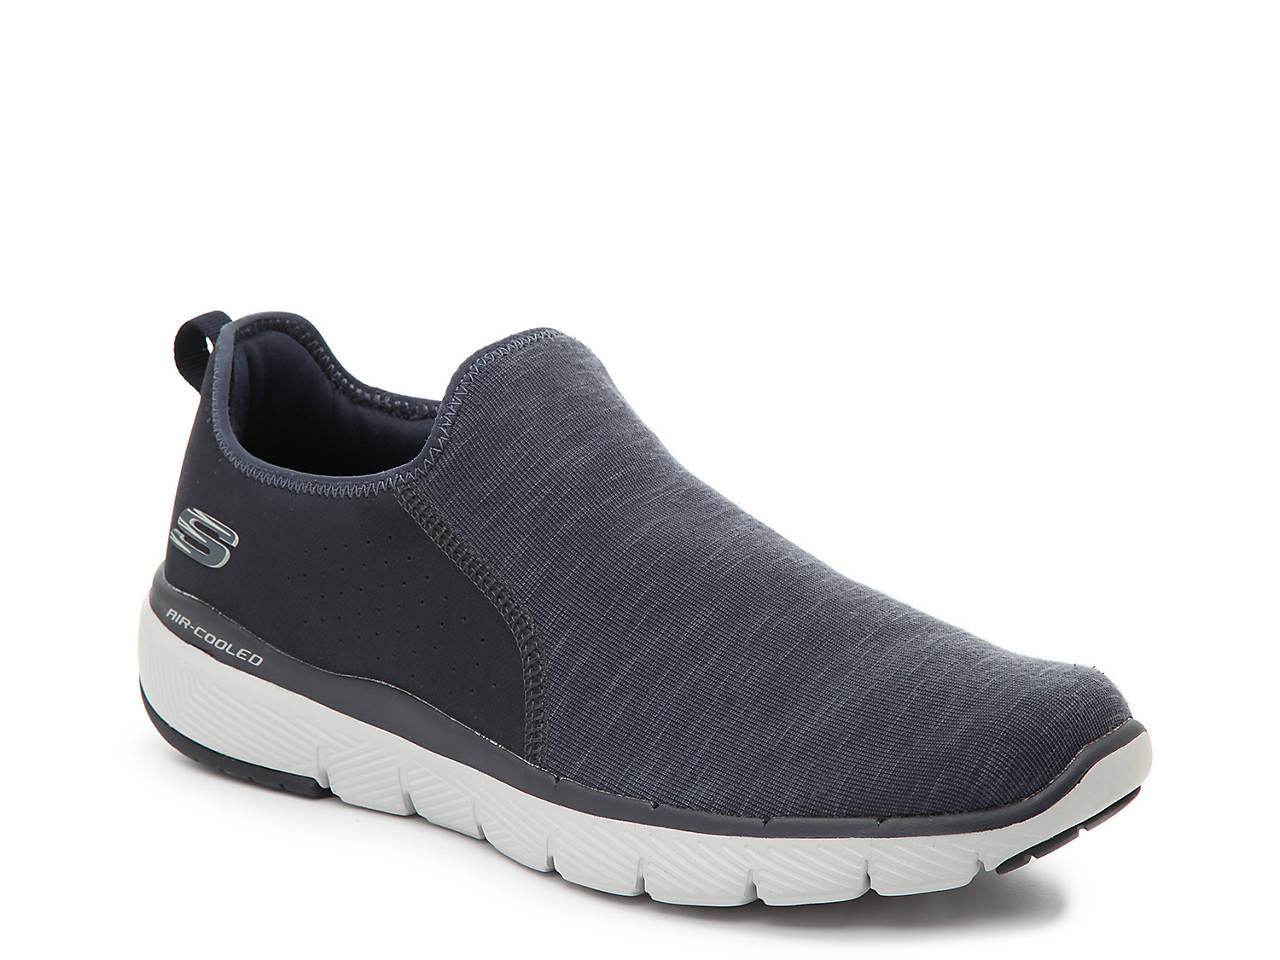 8f4789a5af68 Skechers Flex Advantage 3.0 Slip-On Sneaker - Men s Men s Shoes